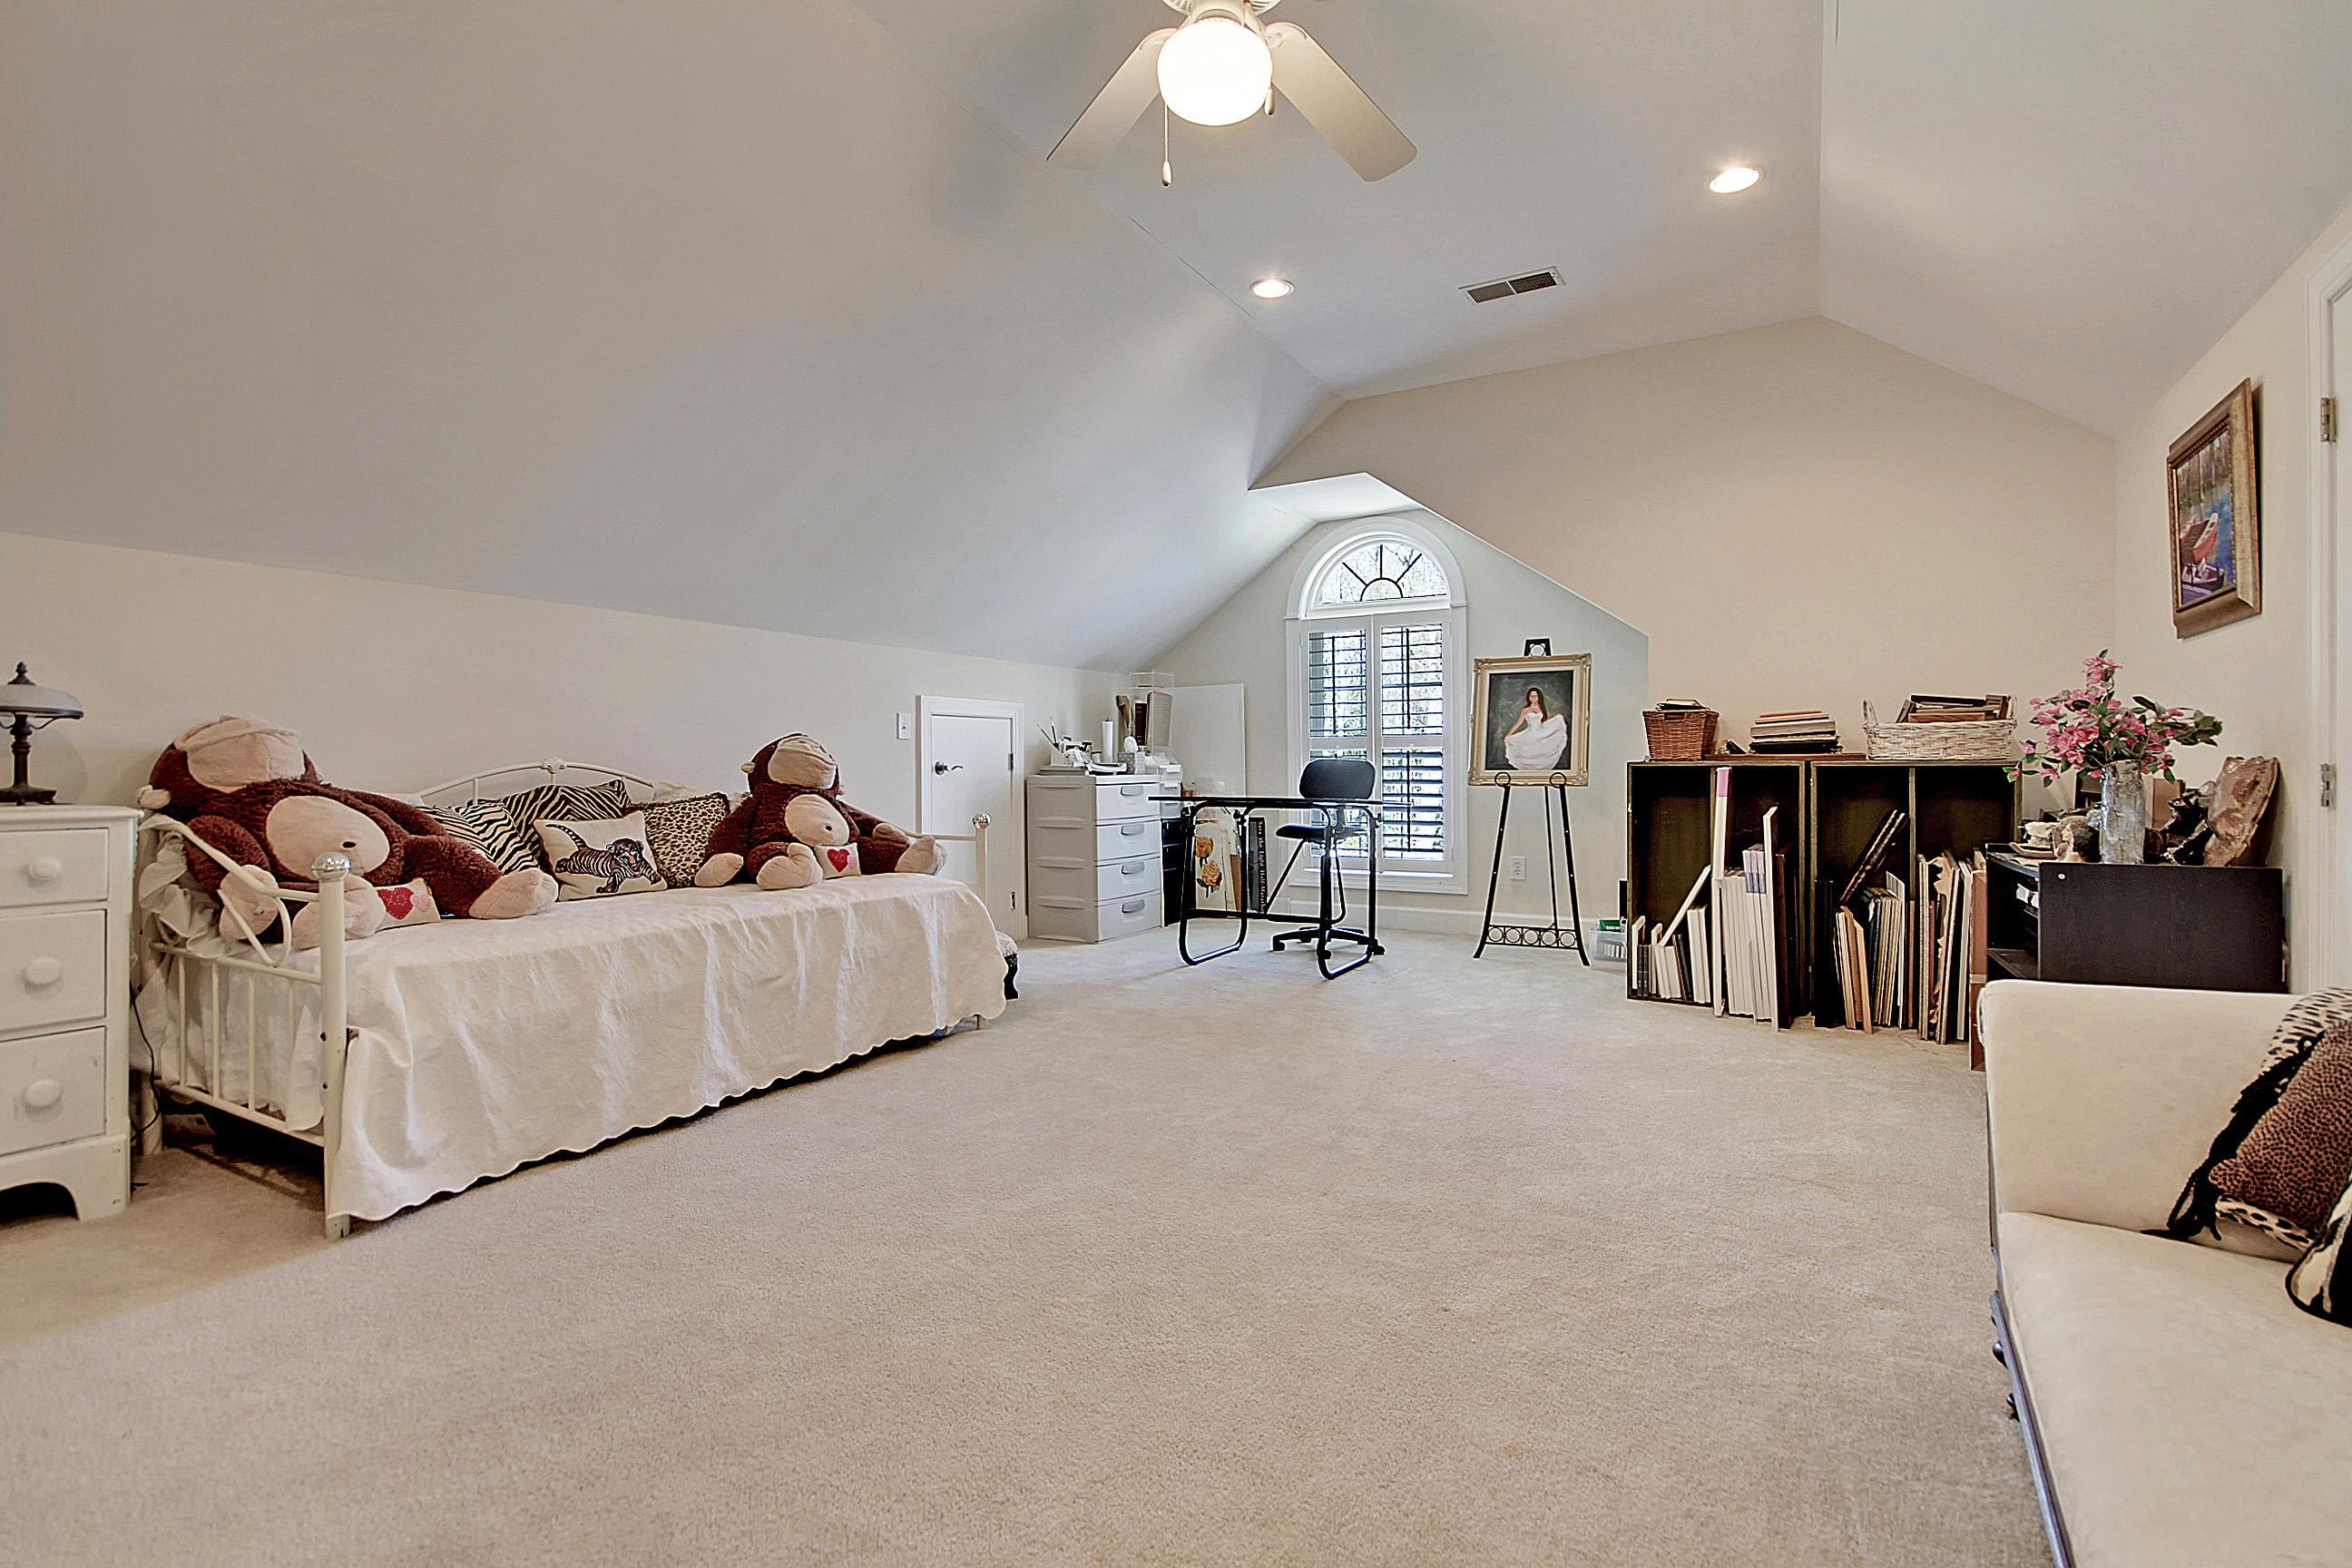 Dunes West Homes For Sale - 4002 Colonel Vanderhorst, Mount Pleasant, SC - 29